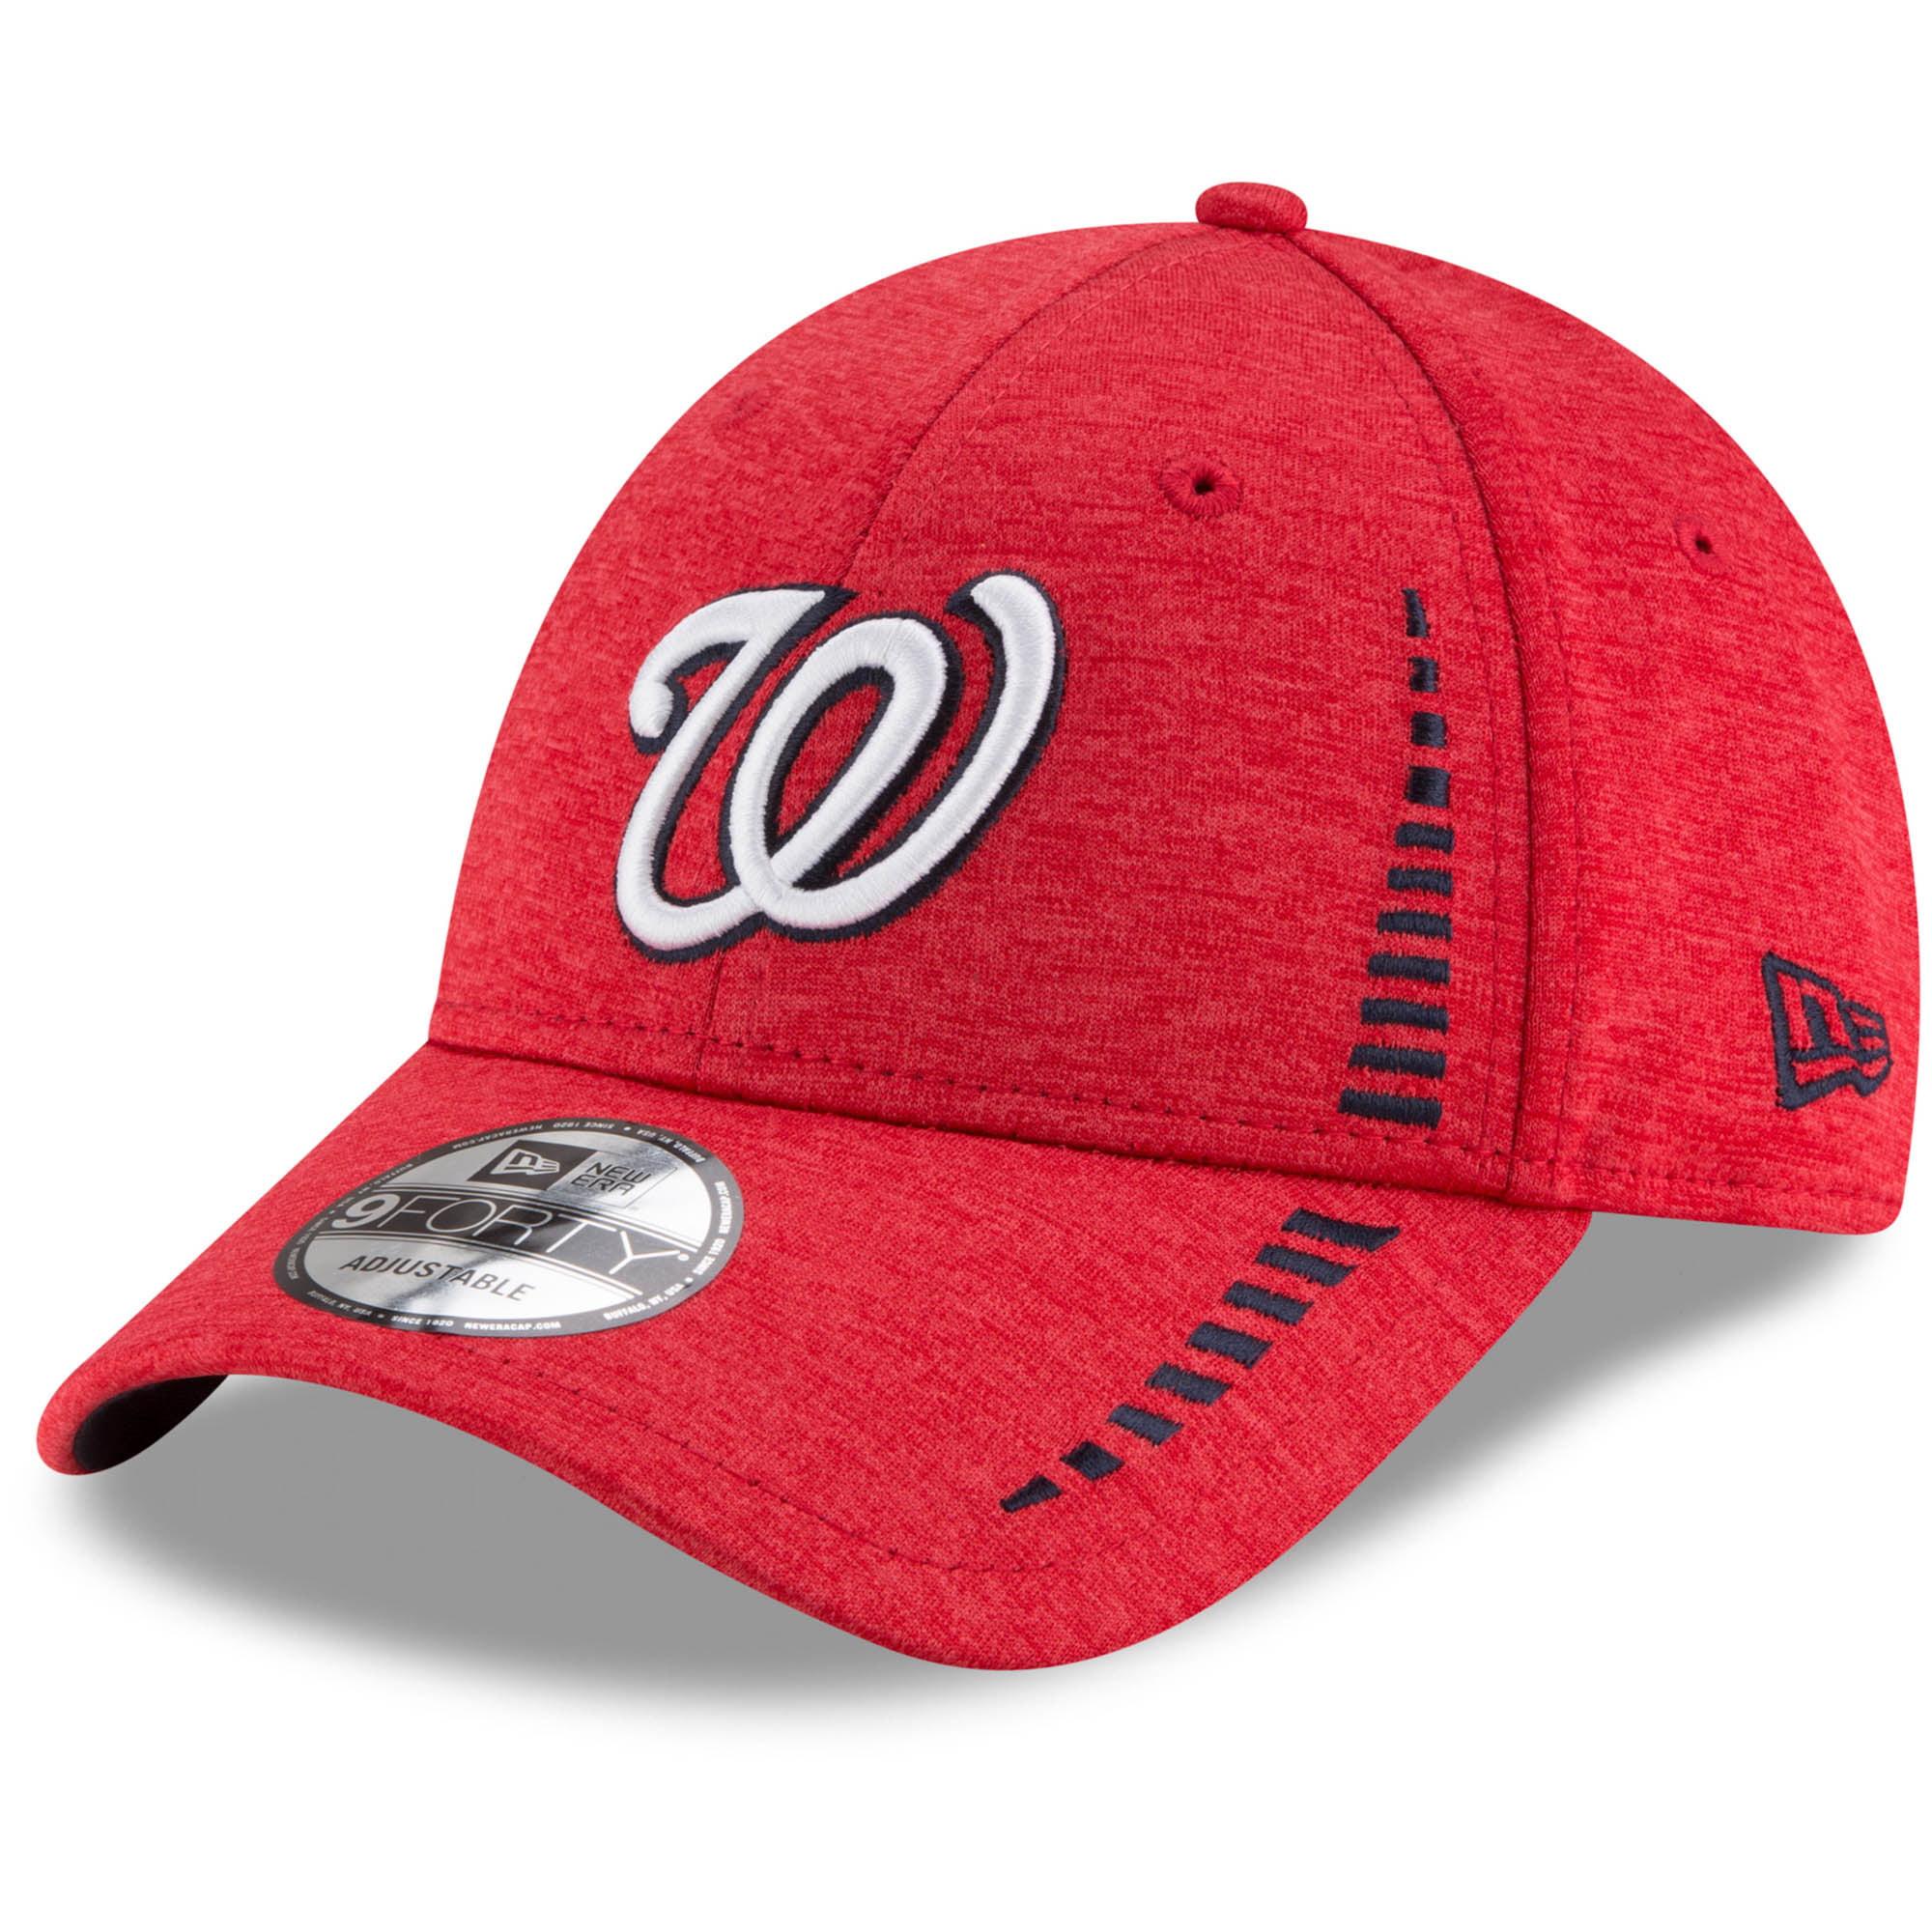 Washington Nationals New Era Speed Shadow Tech 9FORTY Adjustable Hat - Red - OSFA